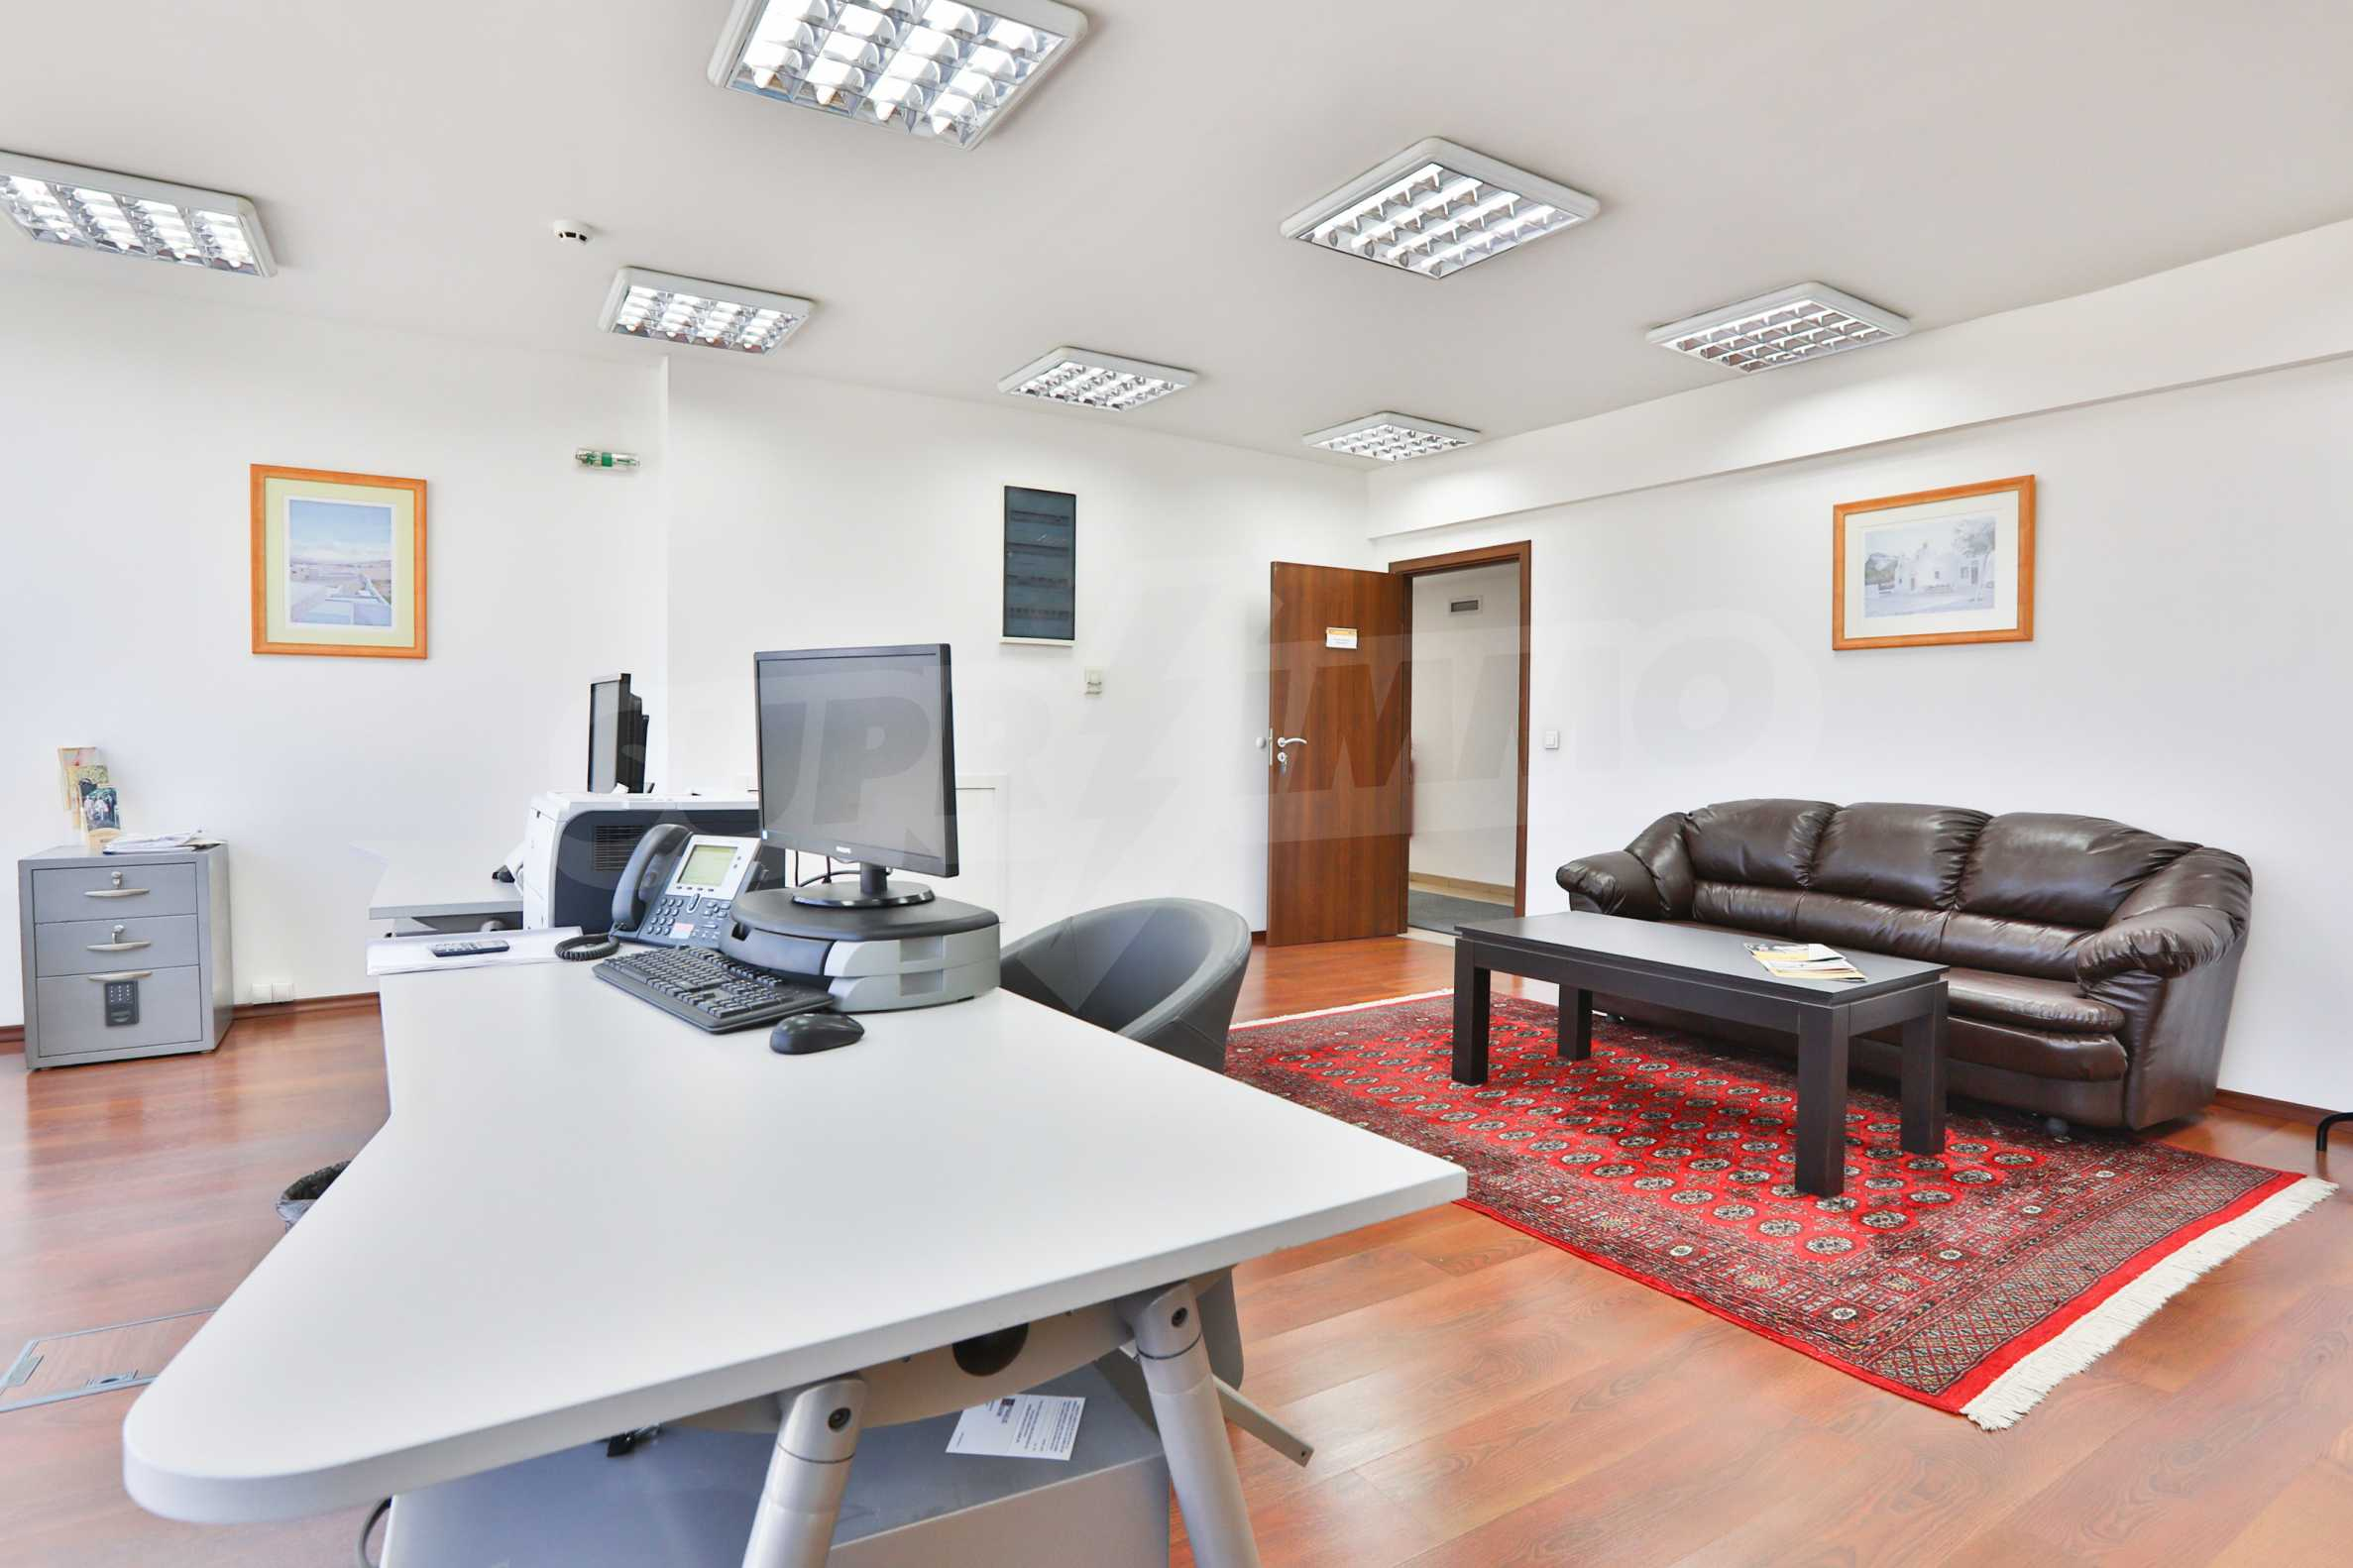 Офис в бизнес сграда висок клас на бул. Цариградско шосе